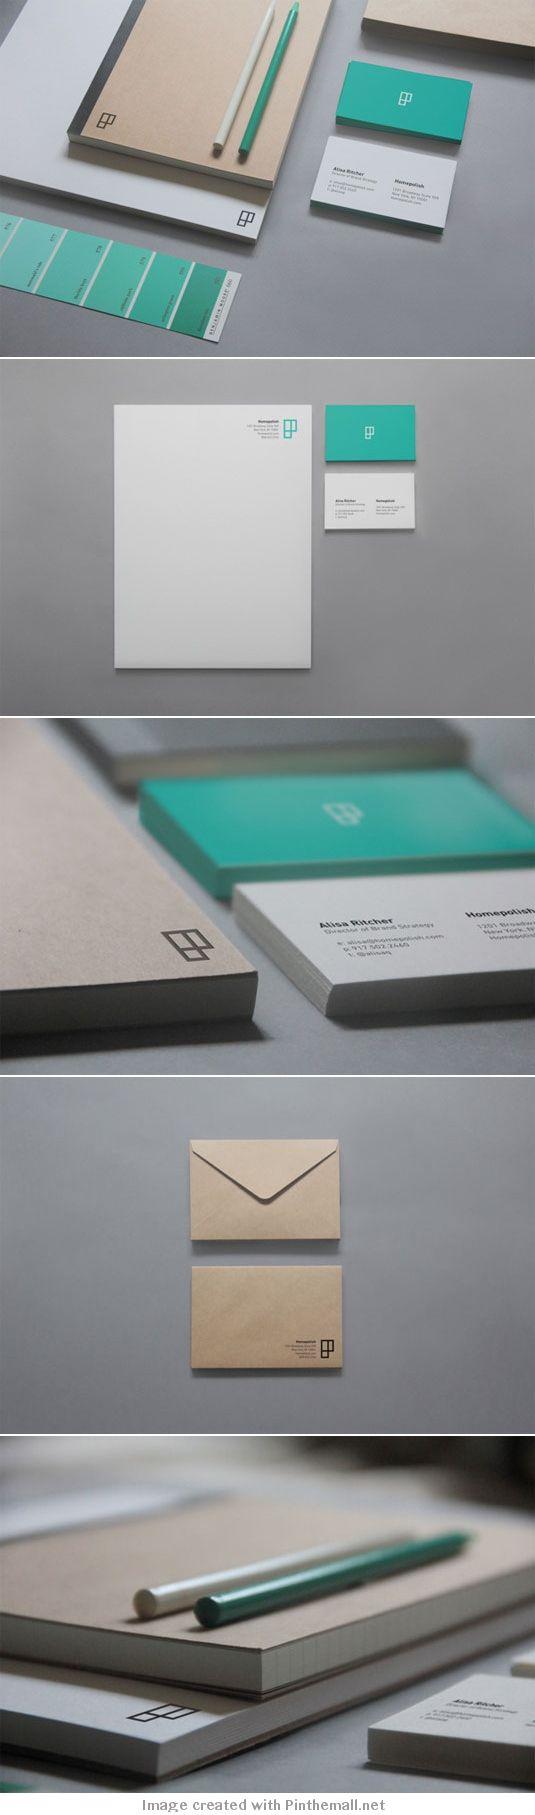 Branding | #stationary #corporate #design #corporatedesign #identity #branding #marketing < repinned by www.BlickeDeeler.de | Visit our website: www.blickedeeler.de/leistungen/corporate-design